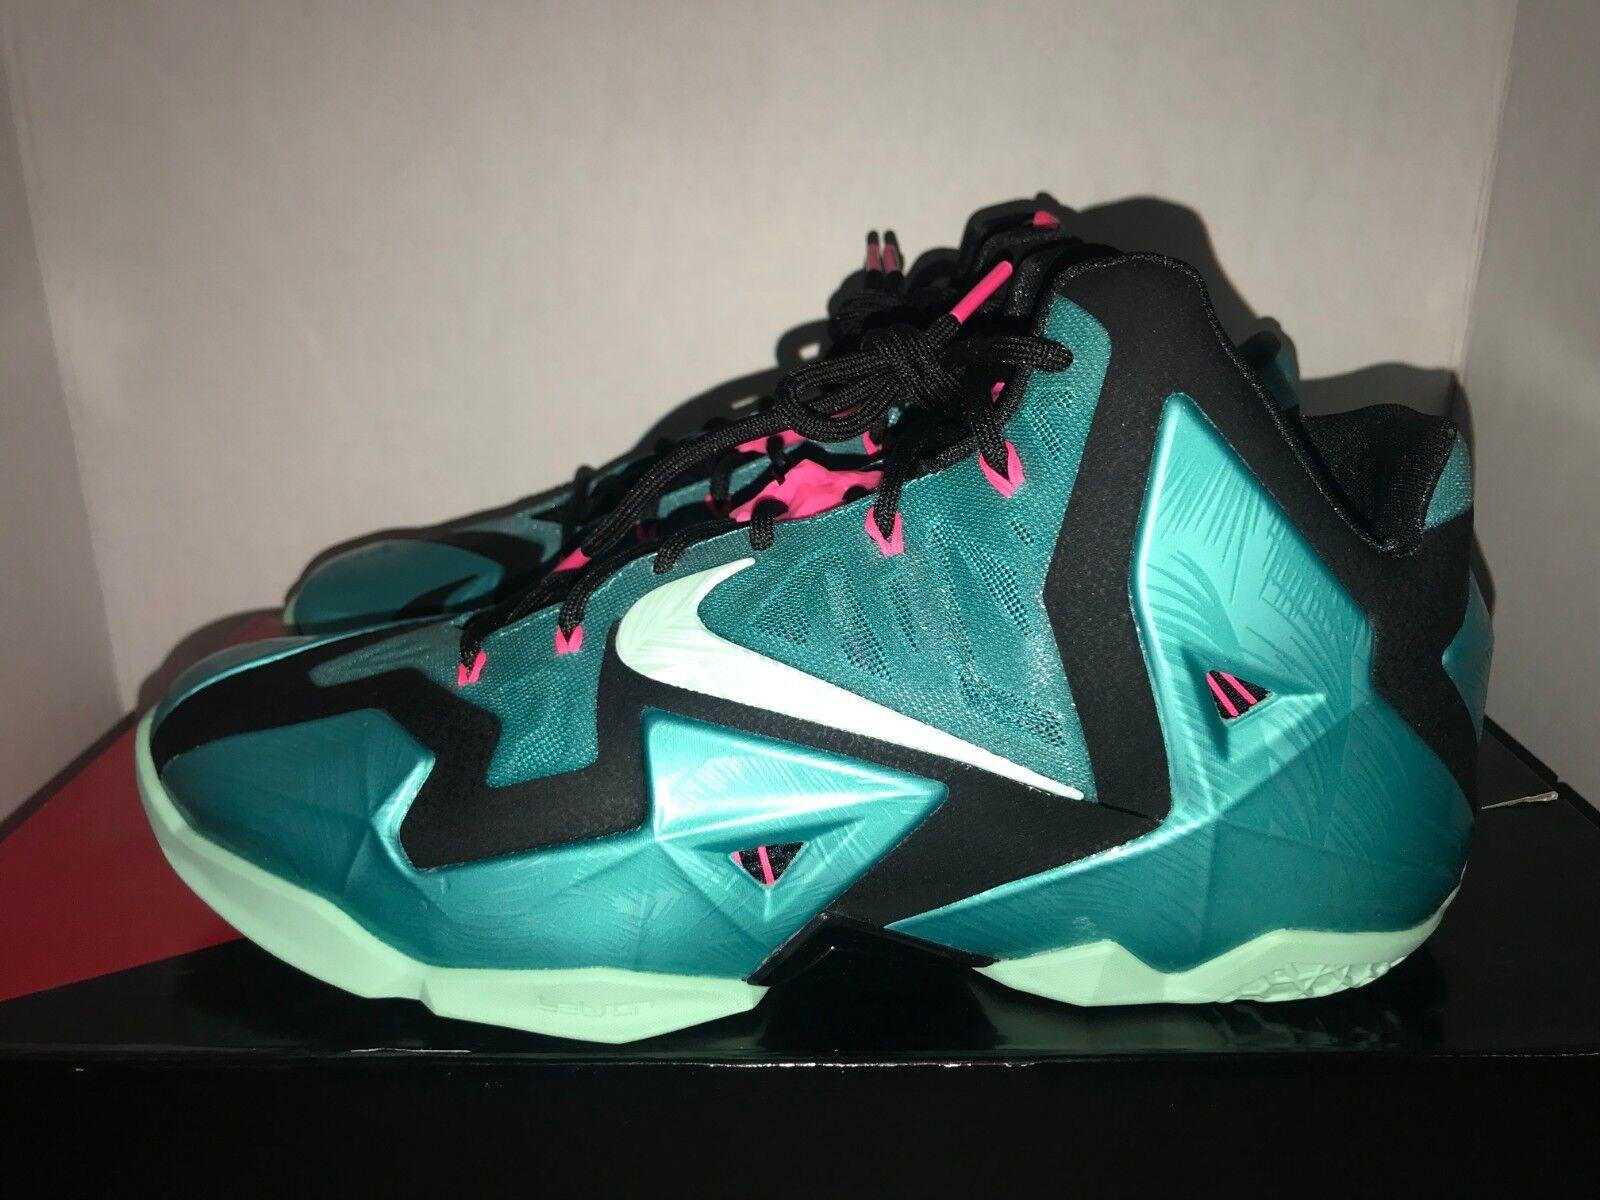 Nike lebron xi south beach männer größe größe größe 5y 11 11,5 13 ds 616175 330 e6b8a8